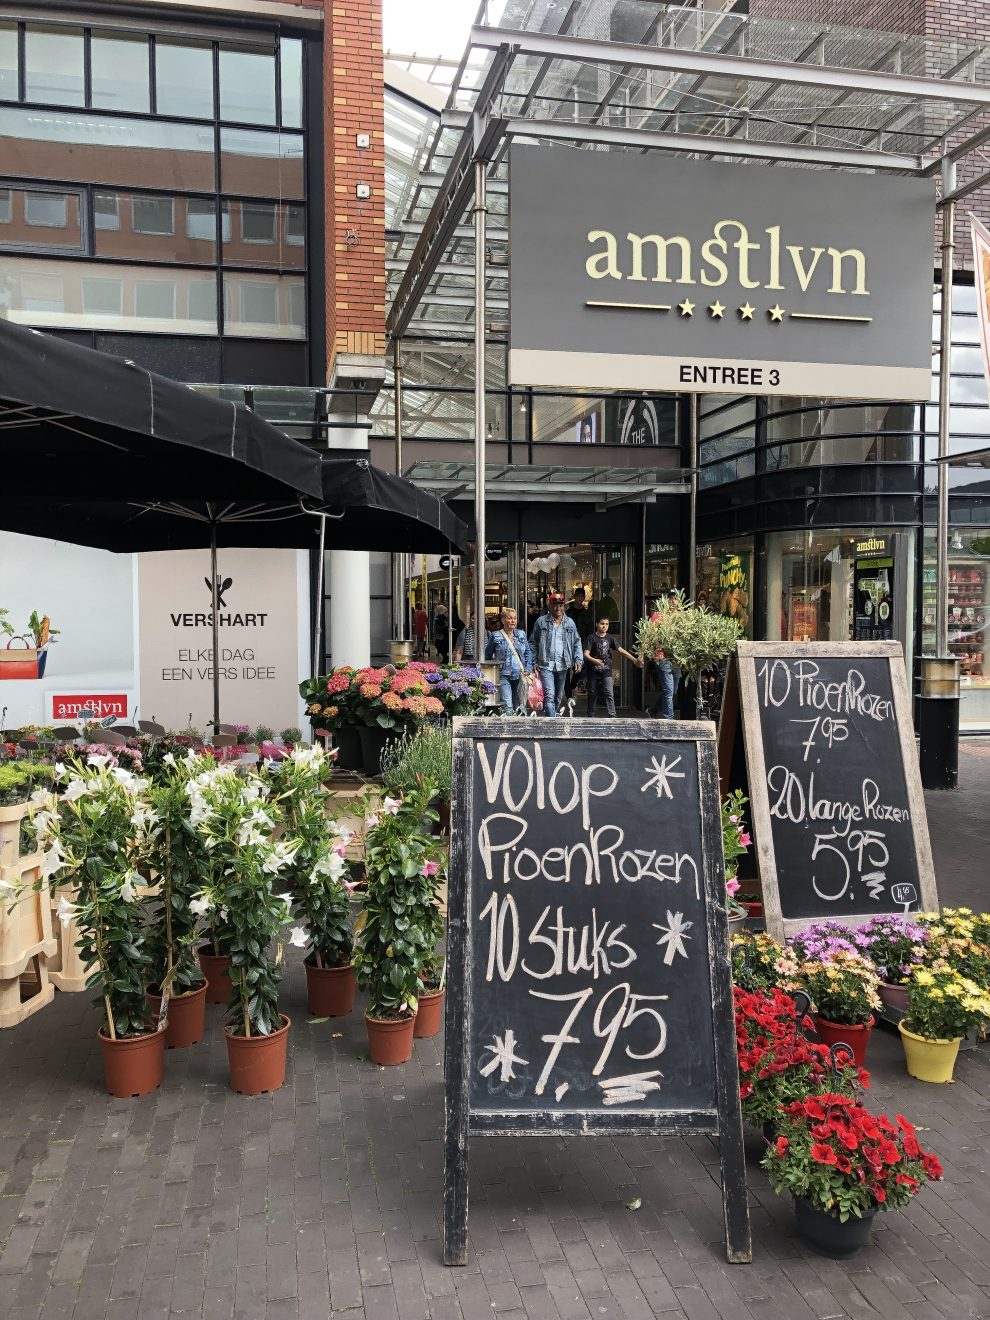 Dagje weg naar Amstelveen. Shoppen Amsterdam, stadshart Amstelveen NA-KD winkel